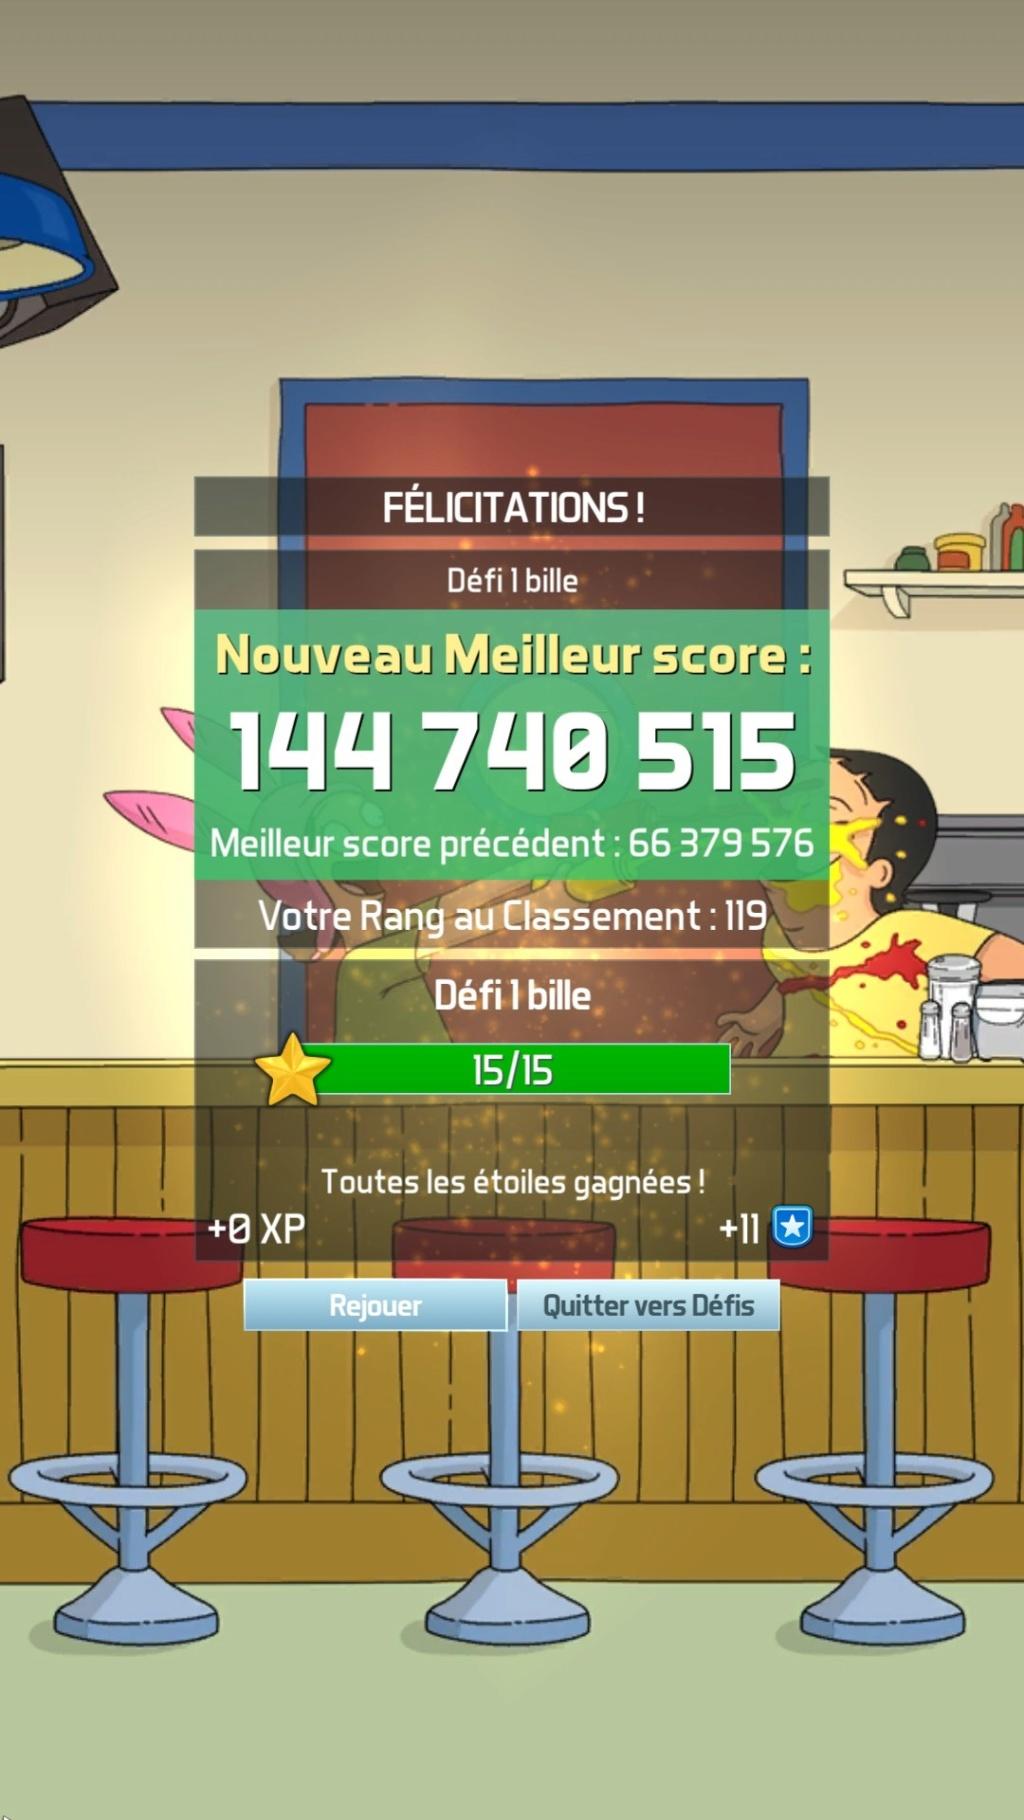 LUP's Club TdM 04.19 : Poissons d'avril • Fish Tales, Bob's Burgers, Family Guy 20190416